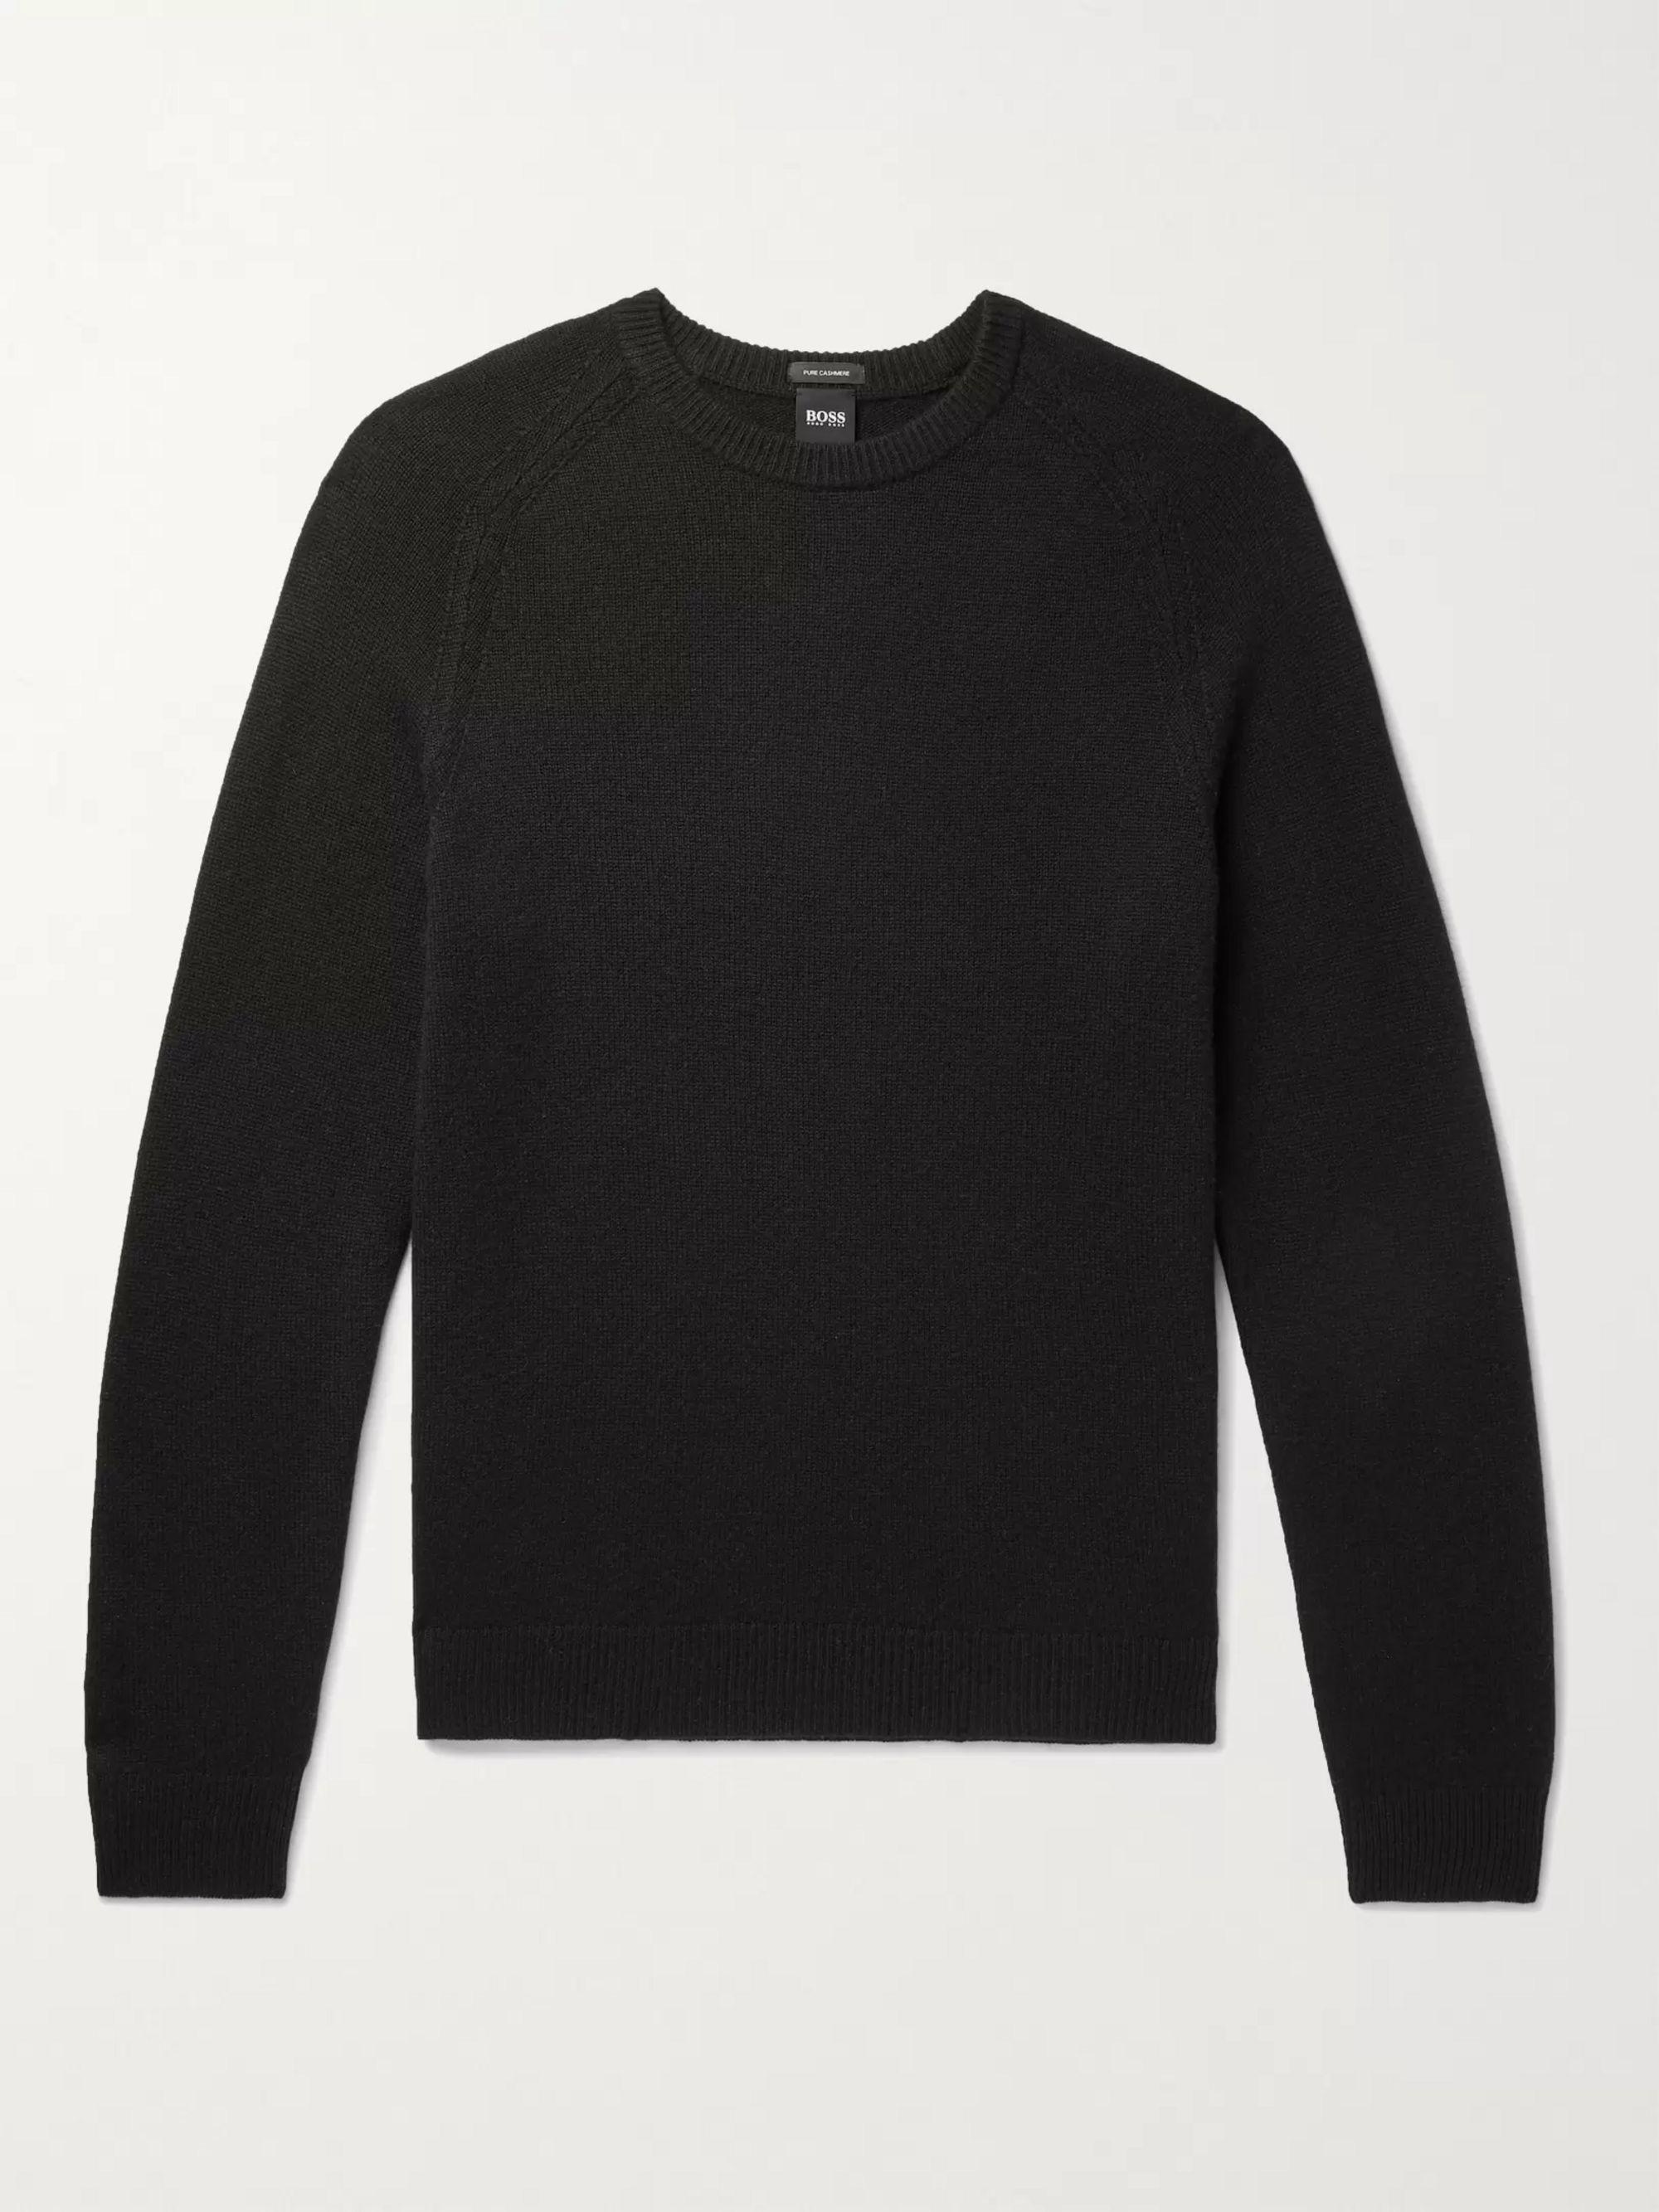 HUGO BOSS Cashmere Sweater